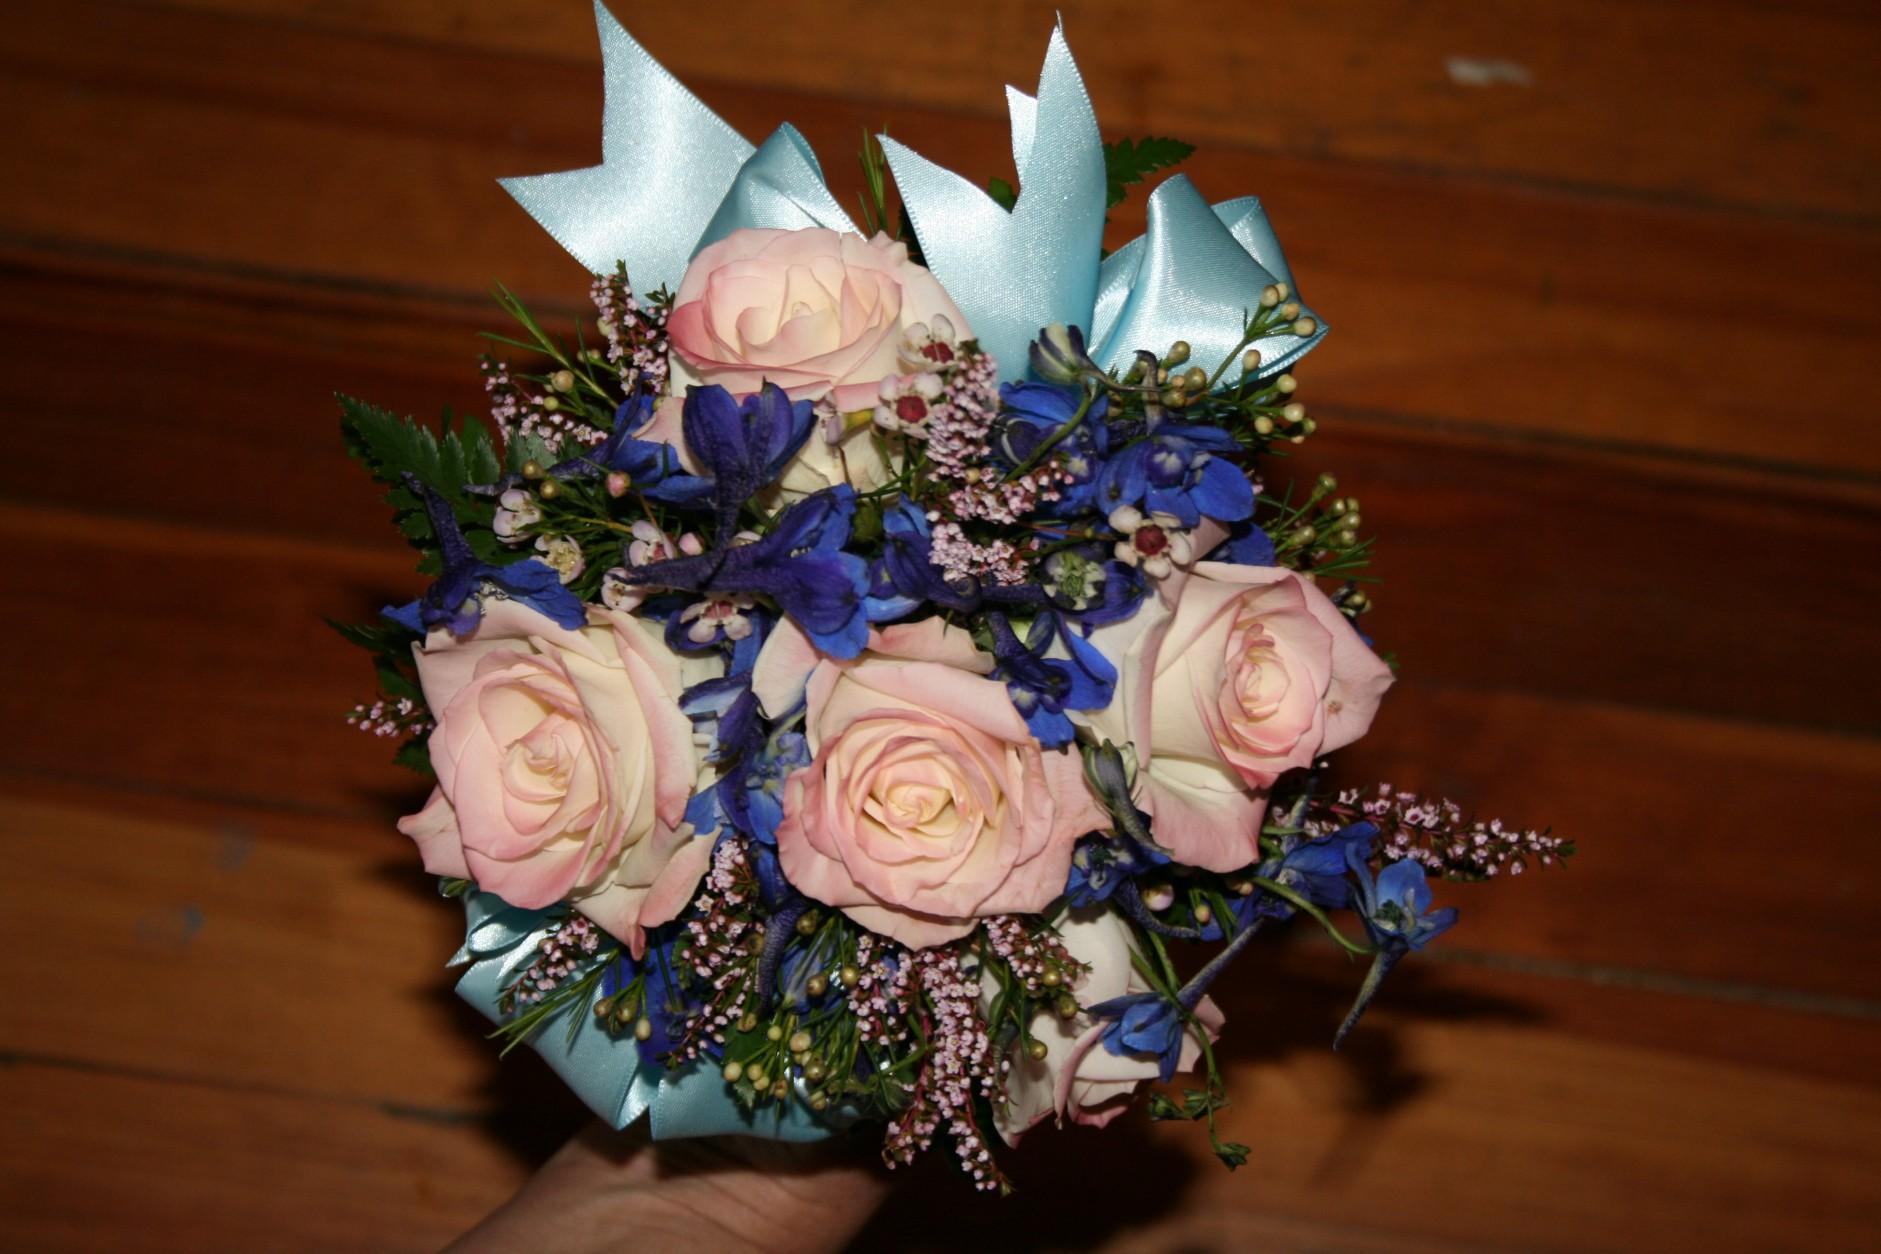 74 PINK TINTED ROSES/ BLUE DELPHINIUM